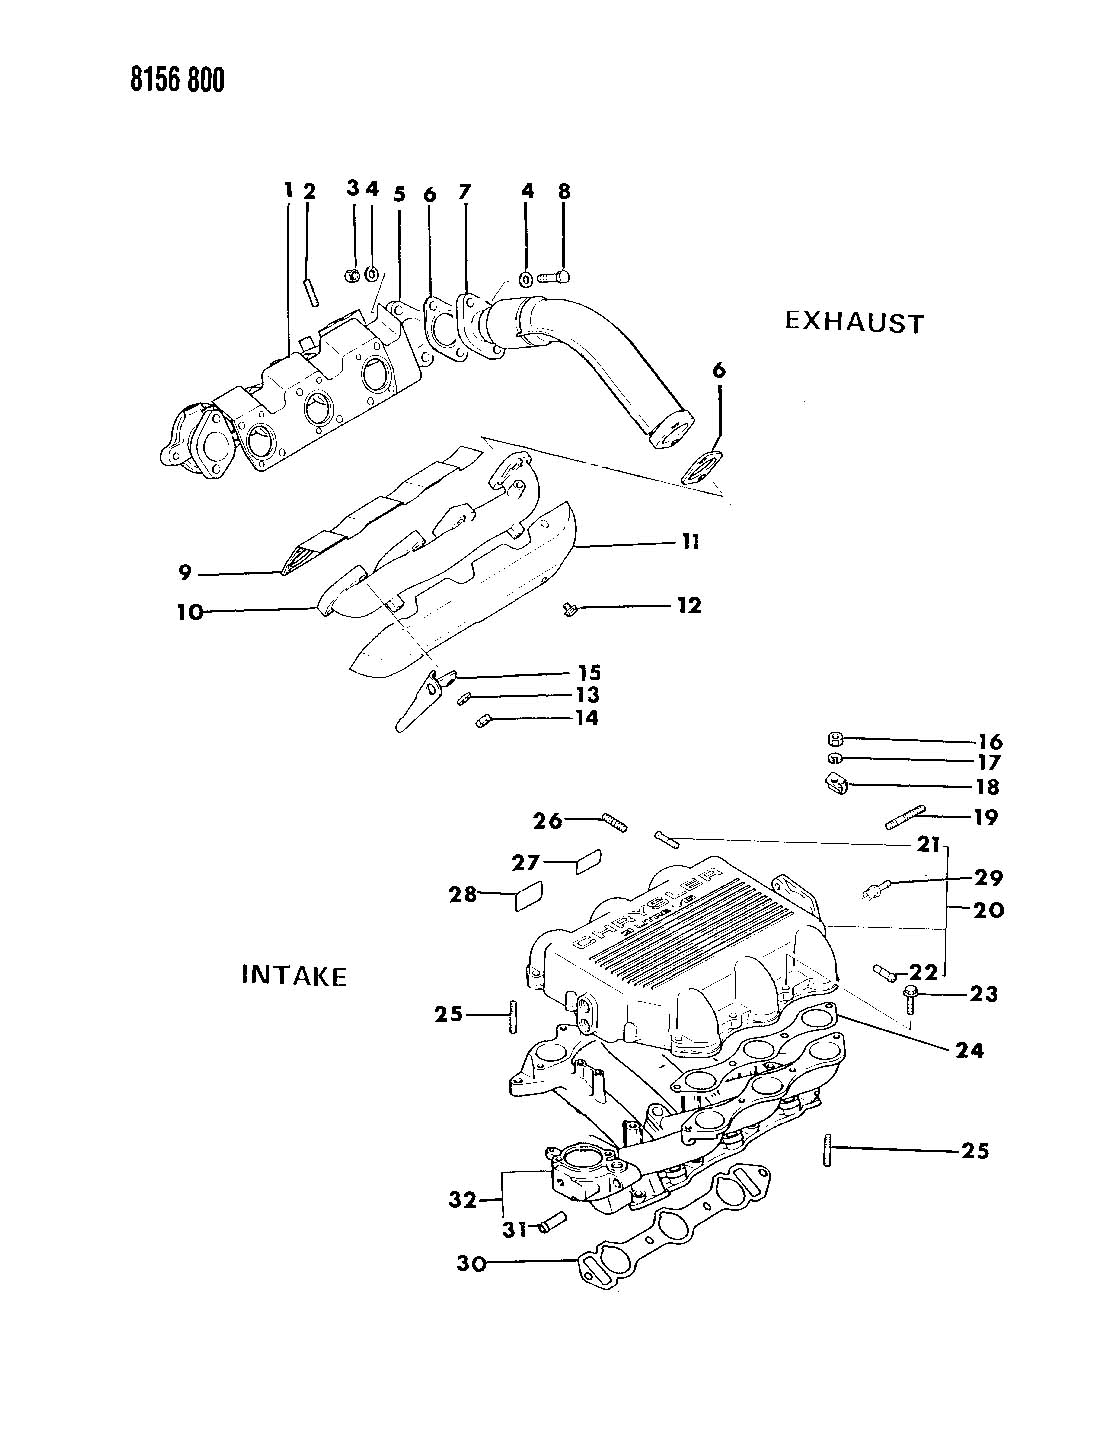 Plymouth Grand Voyager Gasket. Intake plenum. Efa